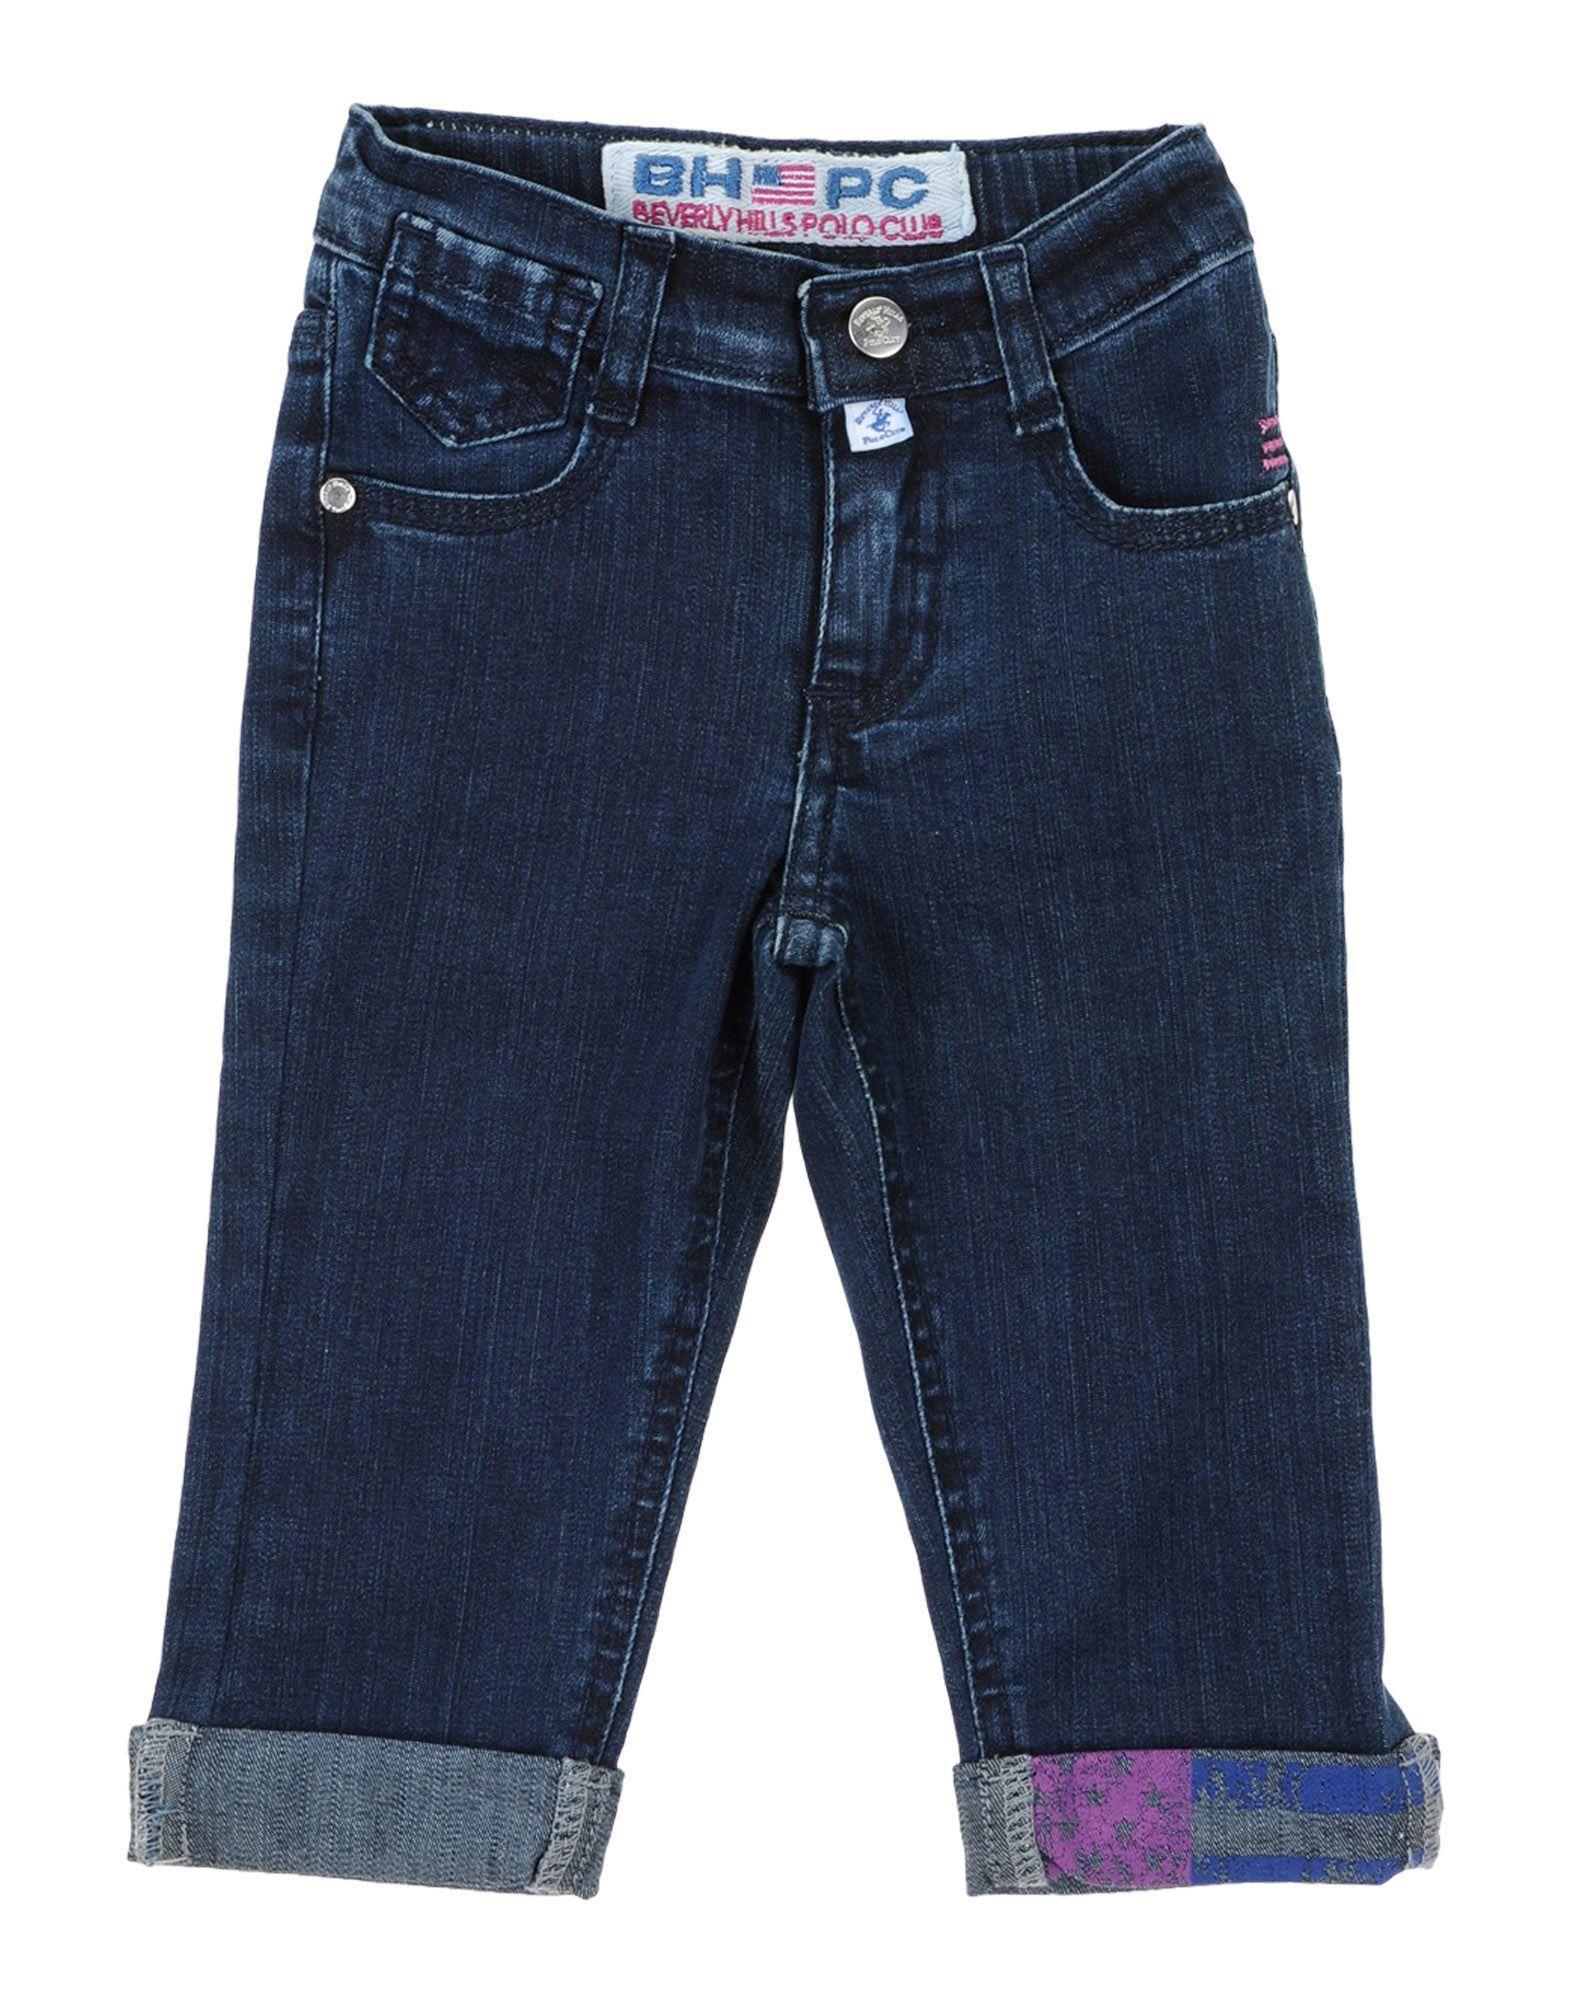 BEVERLY HILLS POLO CLUB Джинсовые брюки bag beverly hills polo club bag